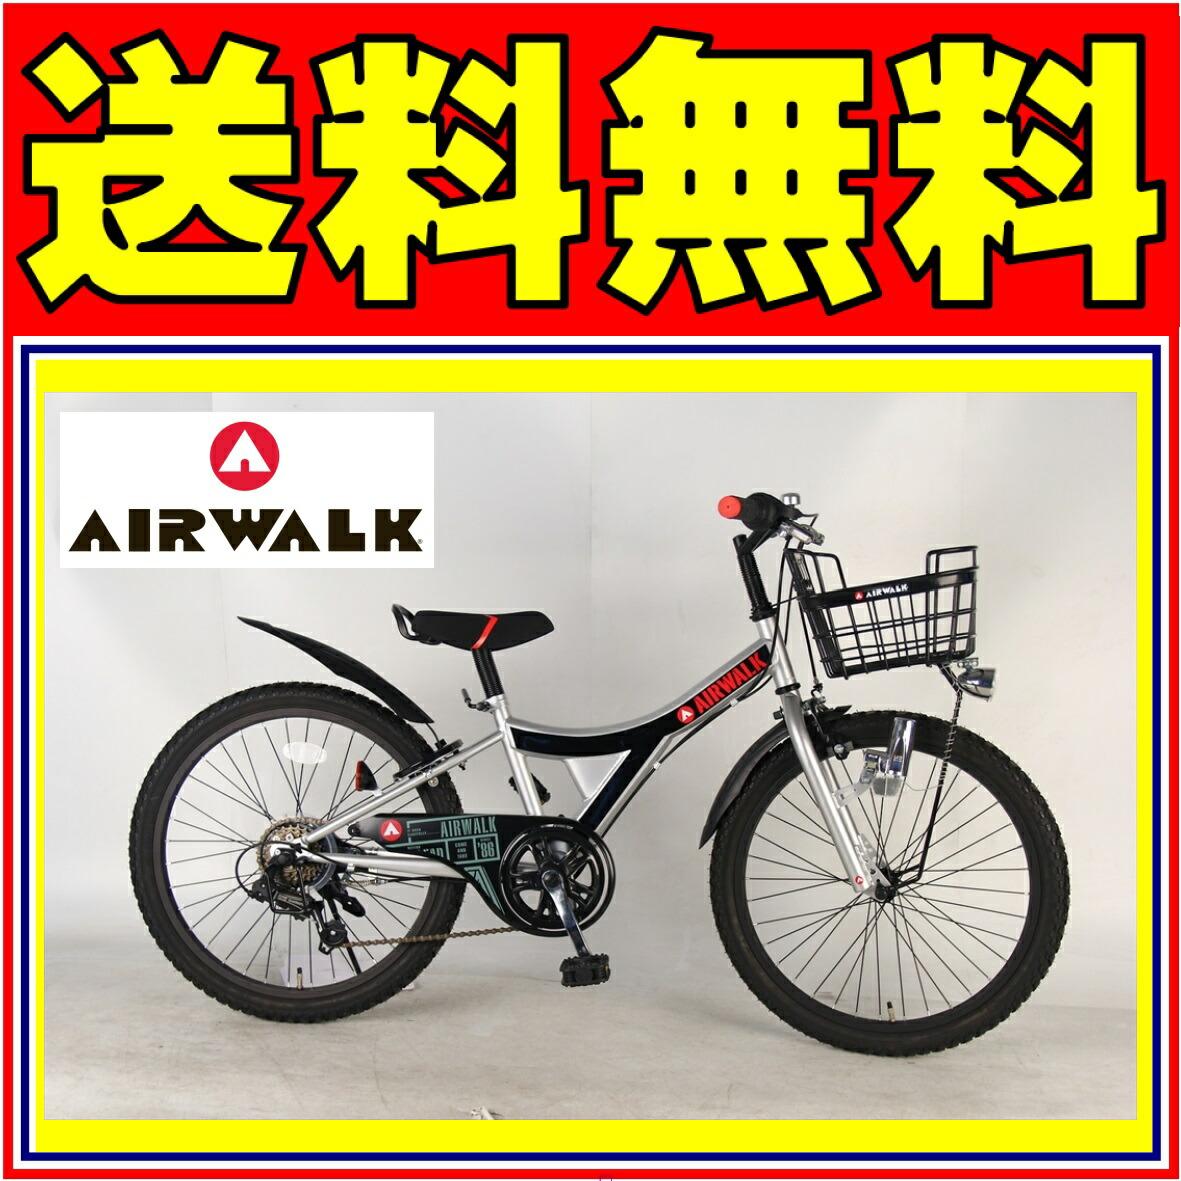 AIRWALK 自転車 子供車 マウンテンバイク シルバー 子供用、男子小学生に最適 MTB/BMX子供車 22インチ 外装6段 マウンテンバイク AIRWALK エアーウォーク 自転車 男の子キッズ 自転車 ジュニア